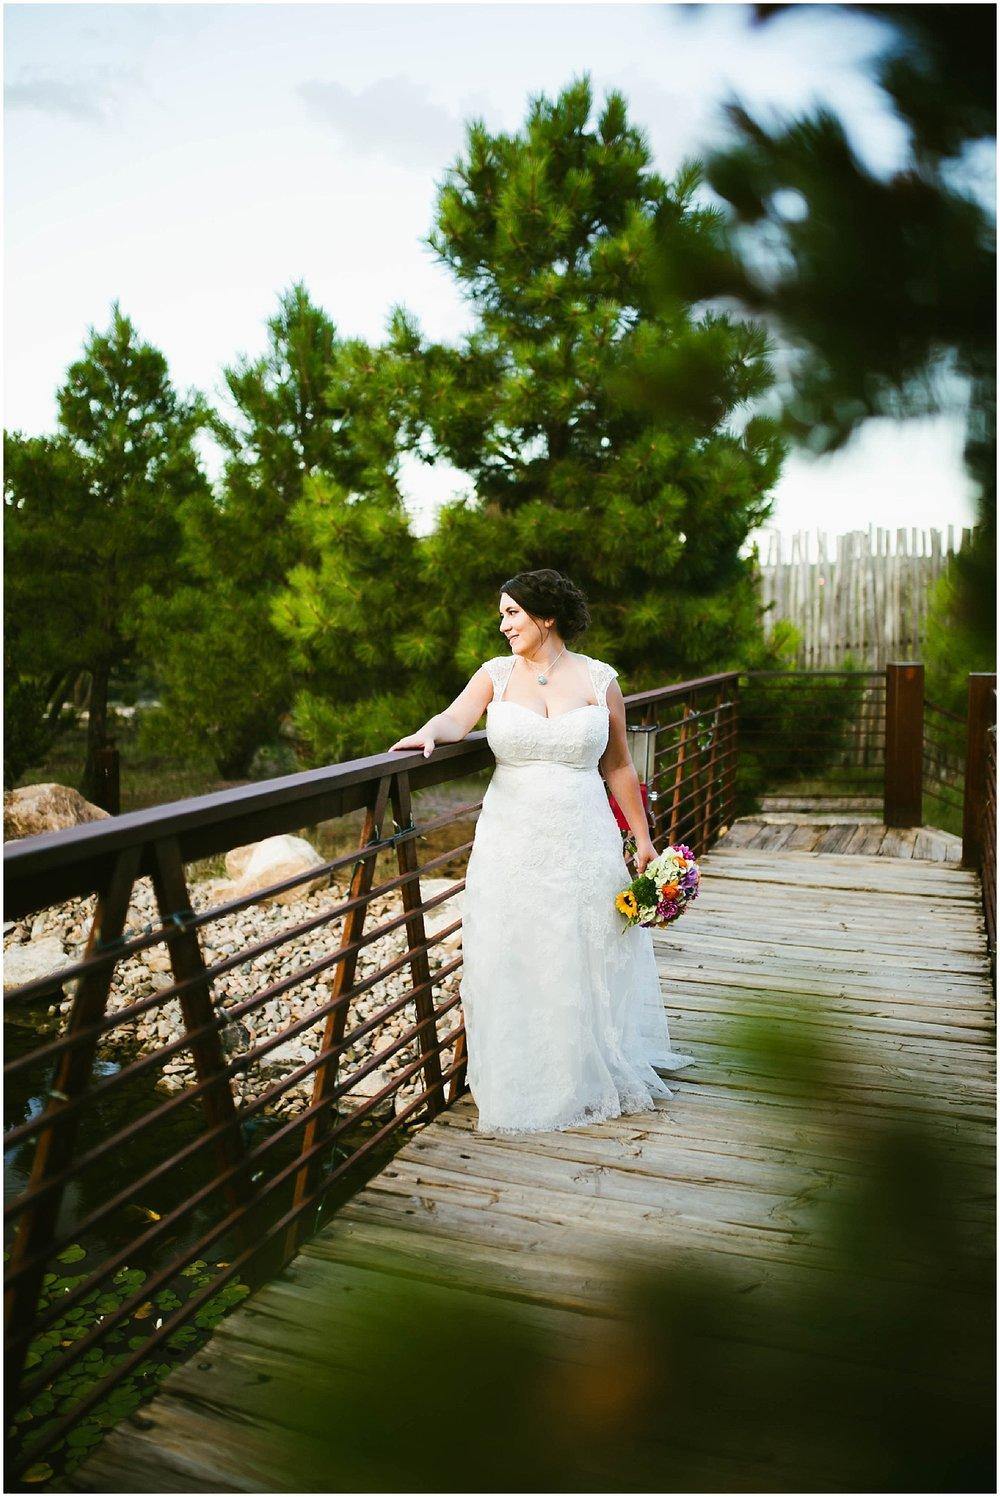 mallory-and-ryan-studio-ghibli-themed-nature-pointe-wedding_0084.jpg